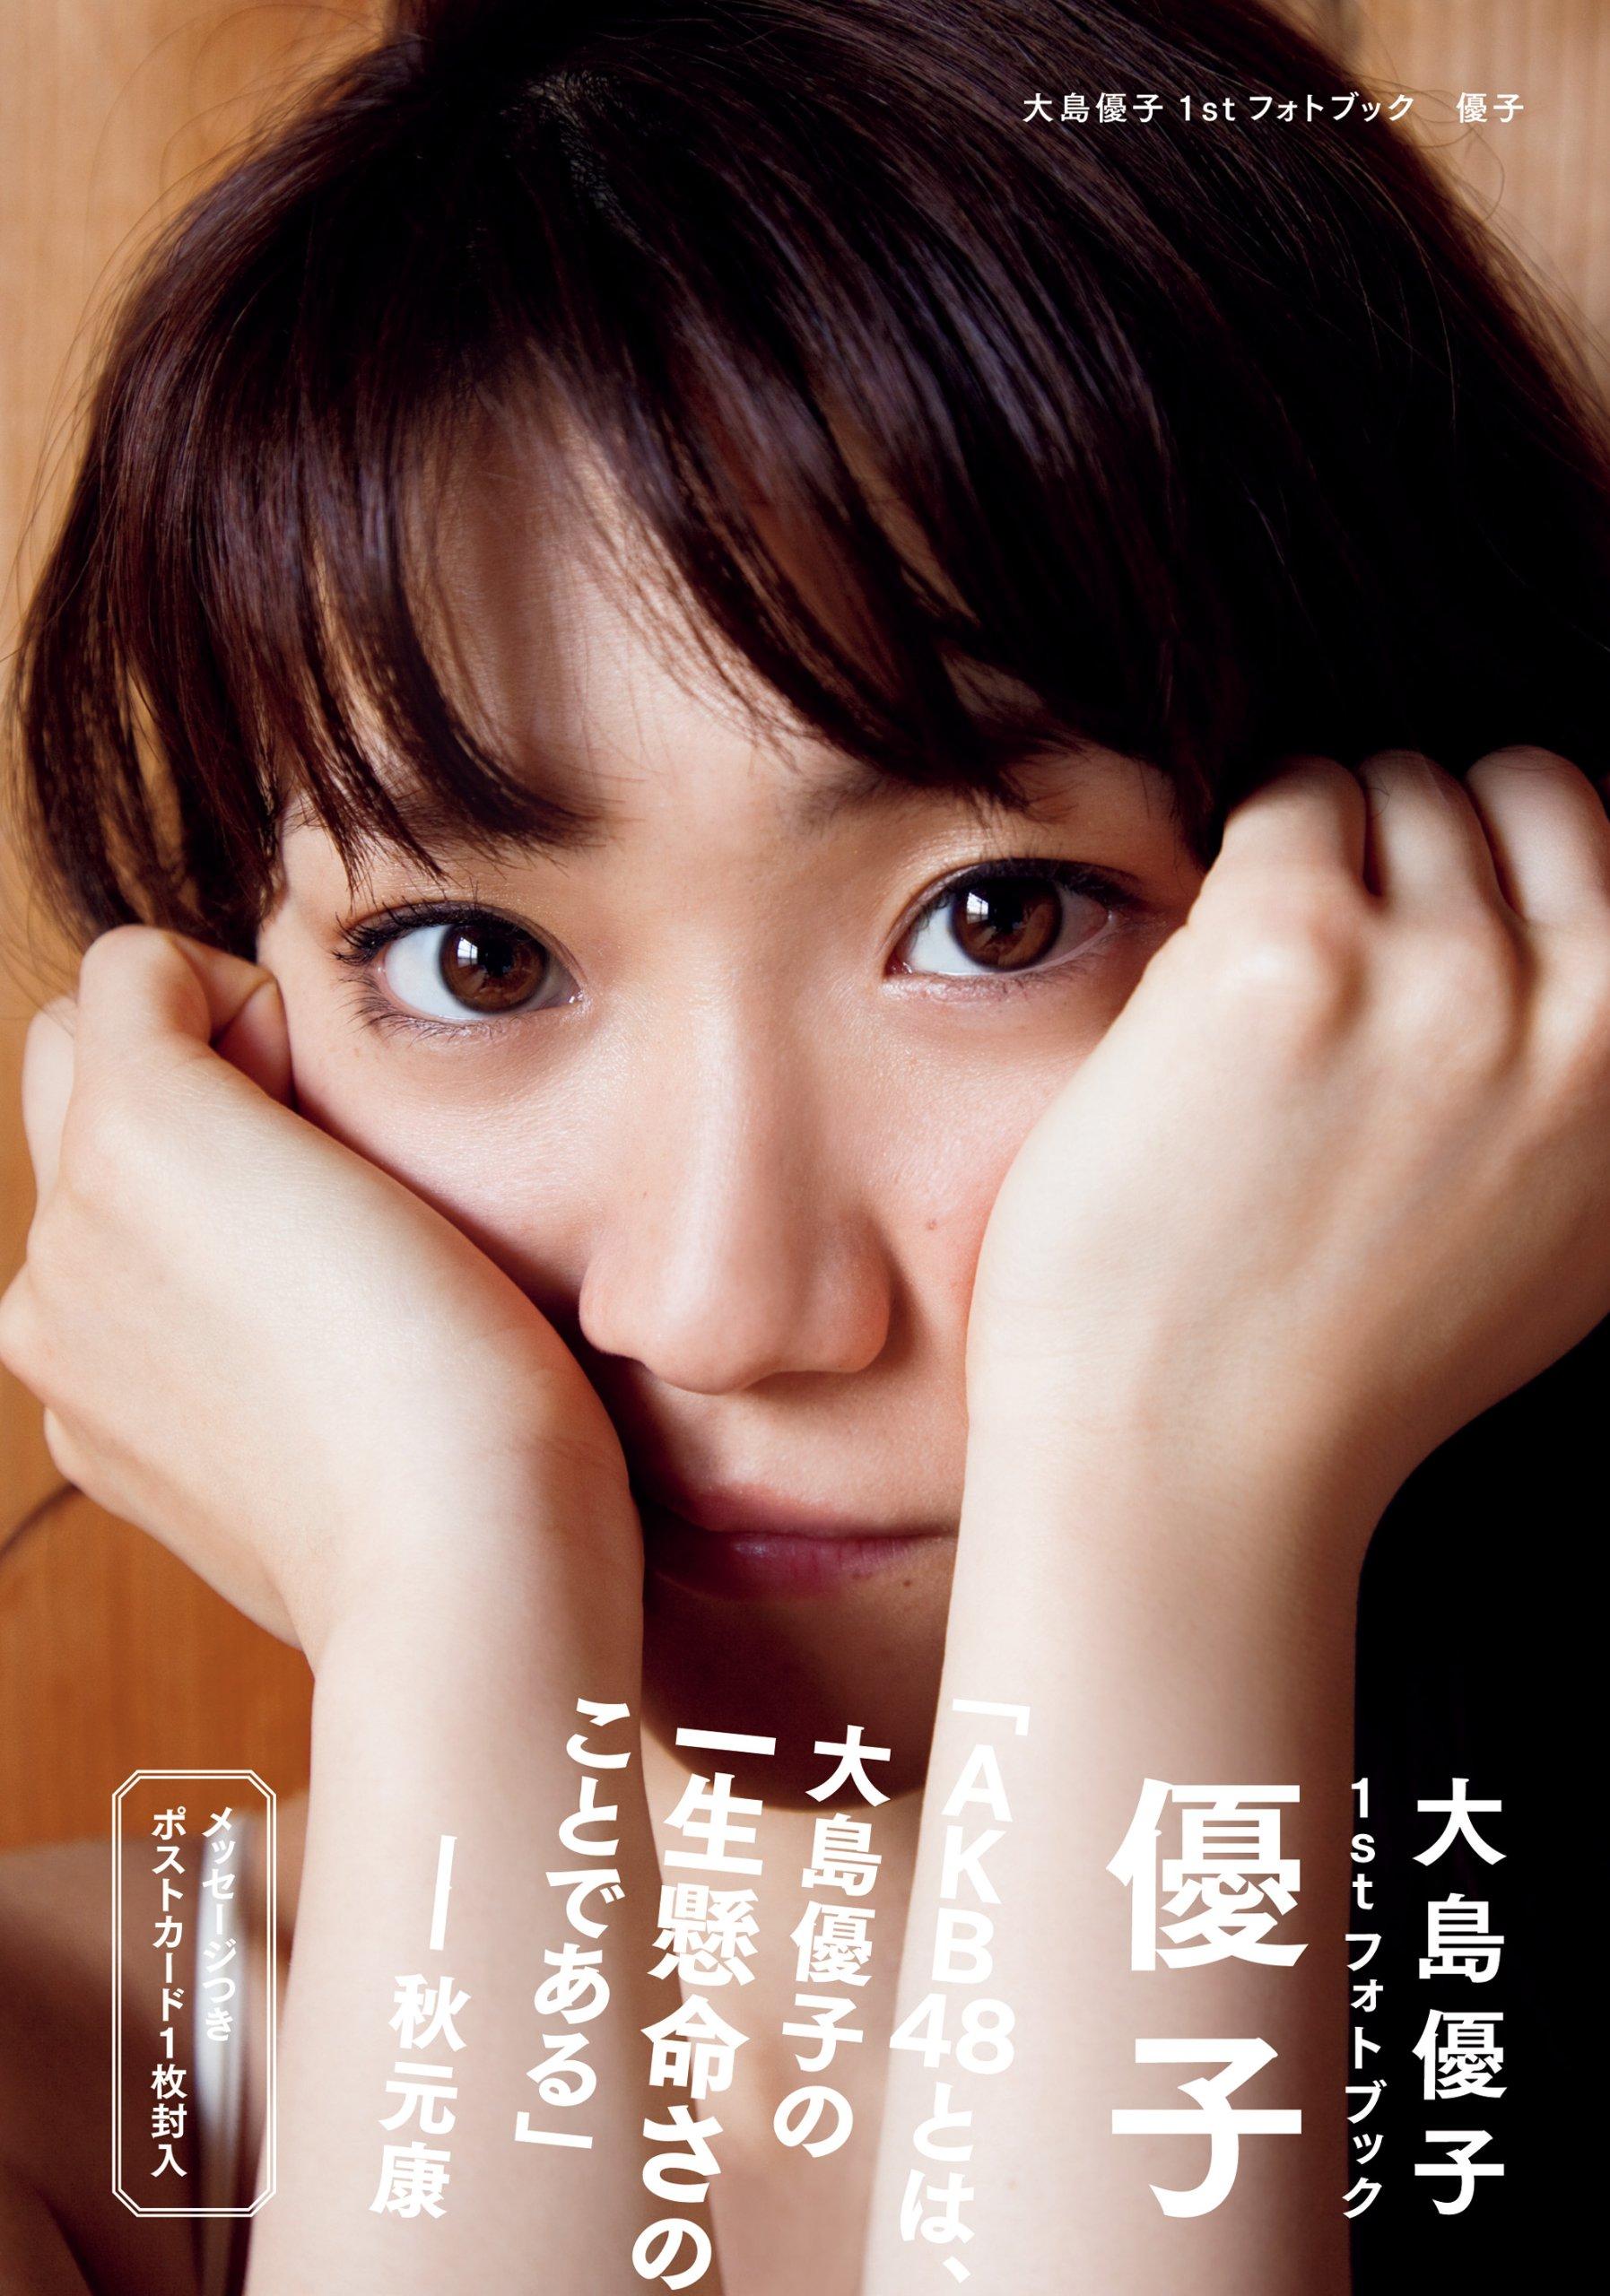 1stフォトブックの大島優子